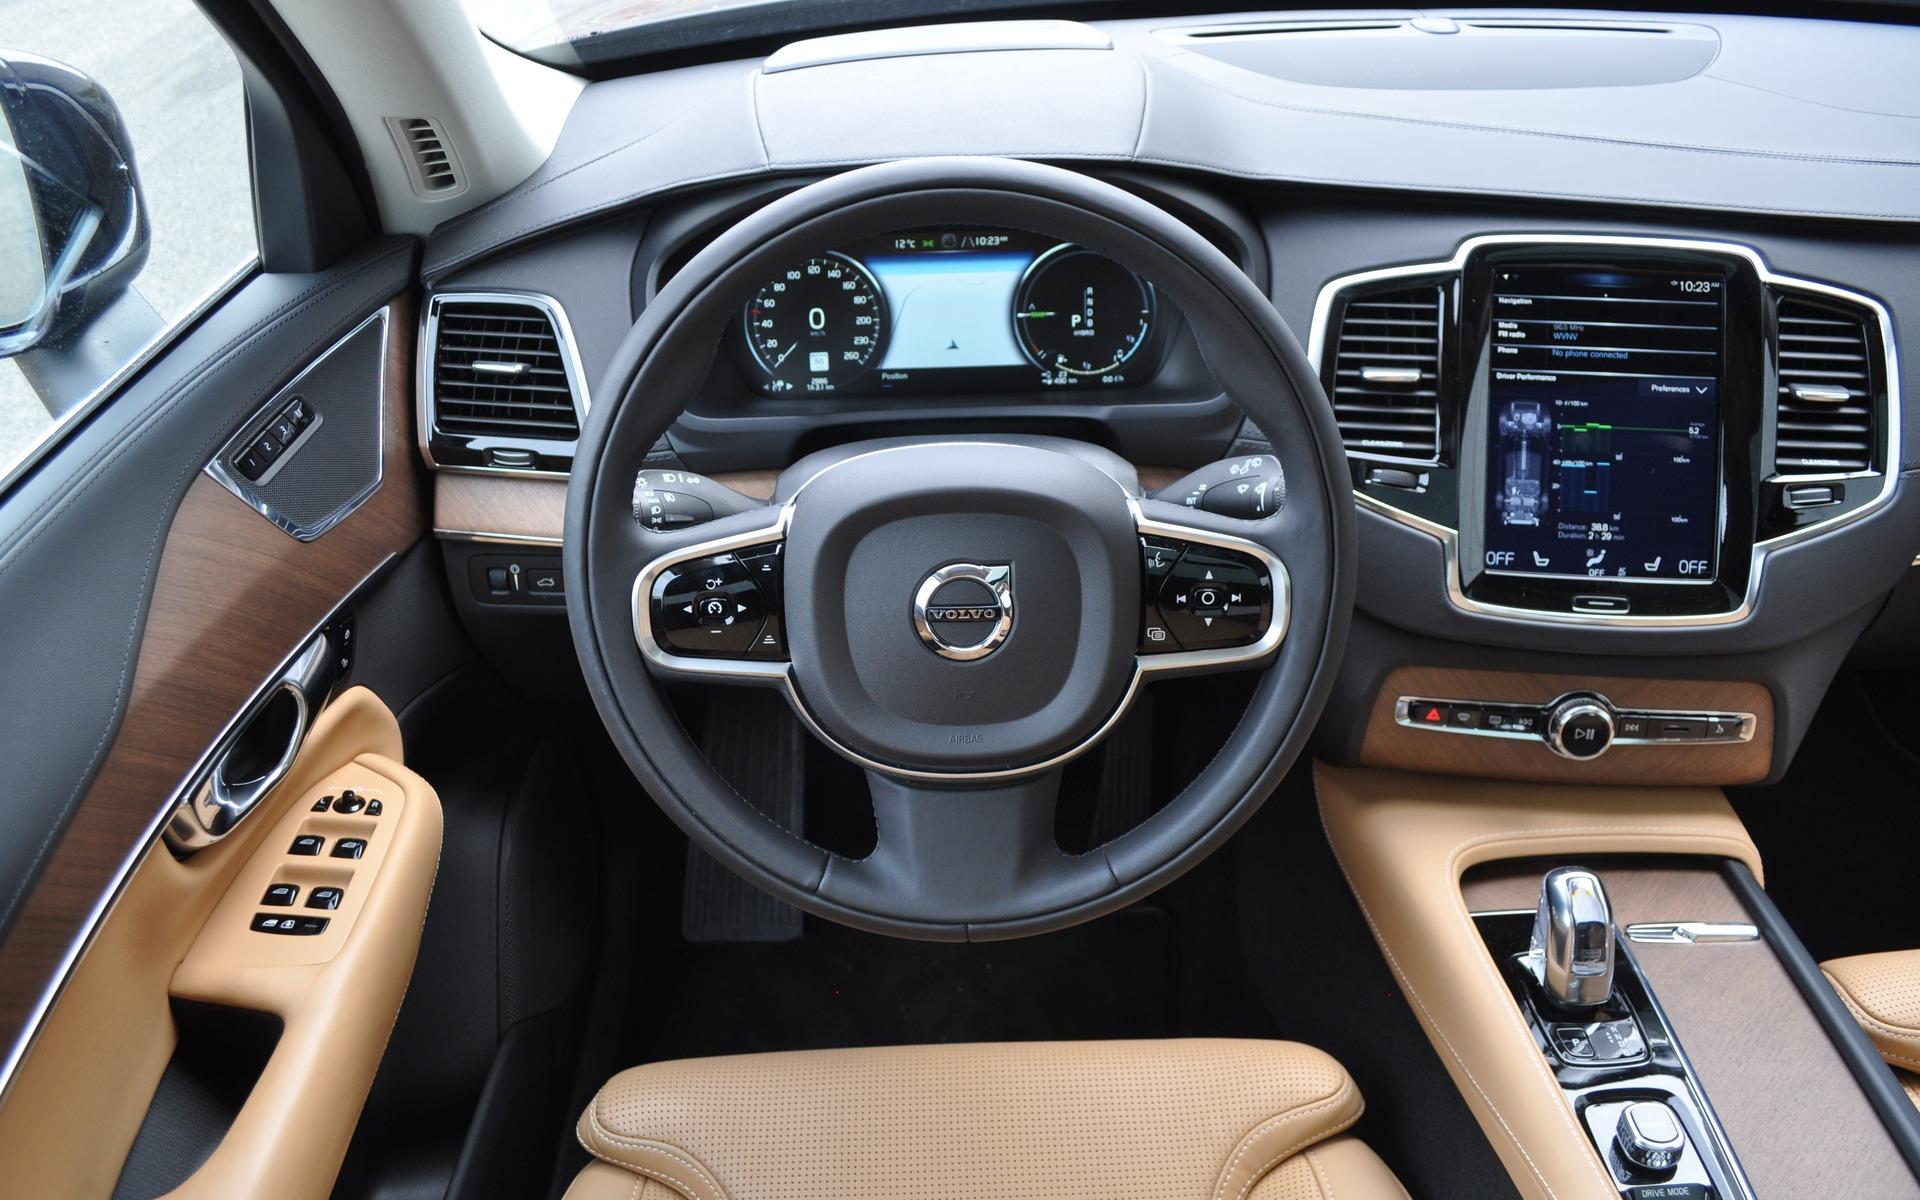 Volvo Xc90 Interior >> 2016 Volvo XC90 T8 Inscription: Efficiency, Luxury and Performance - 3/27